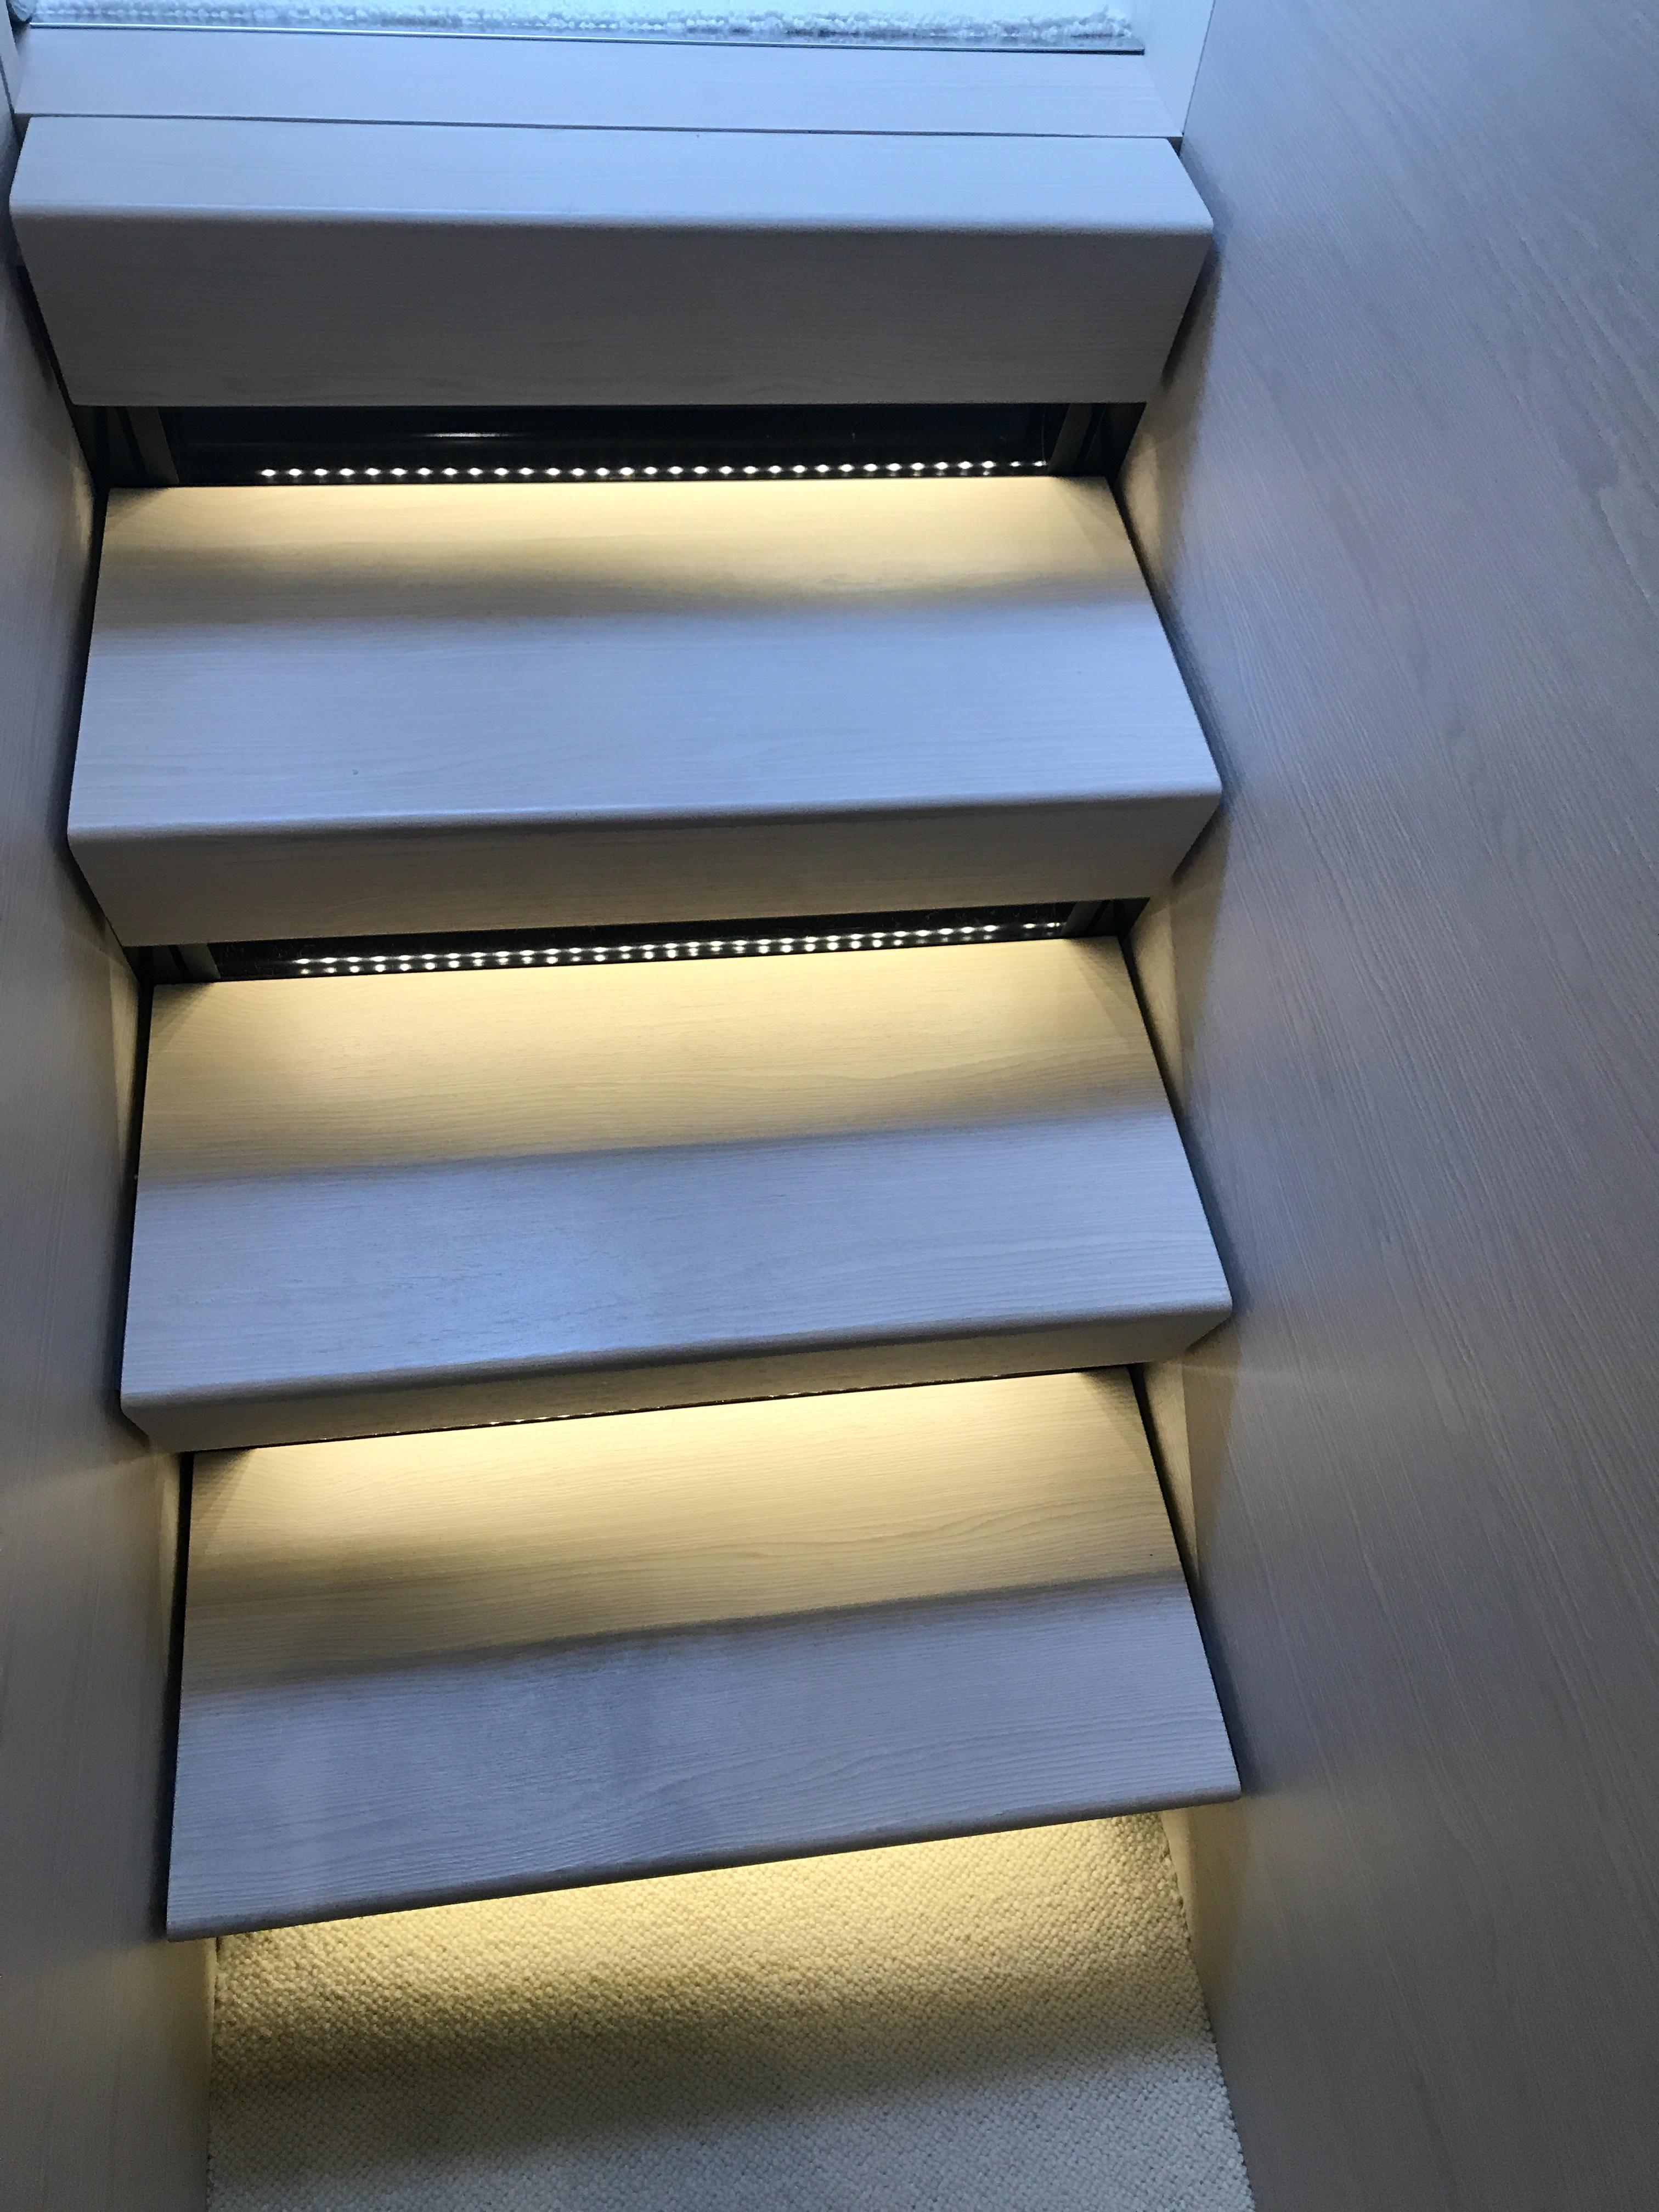 Steps lower deck